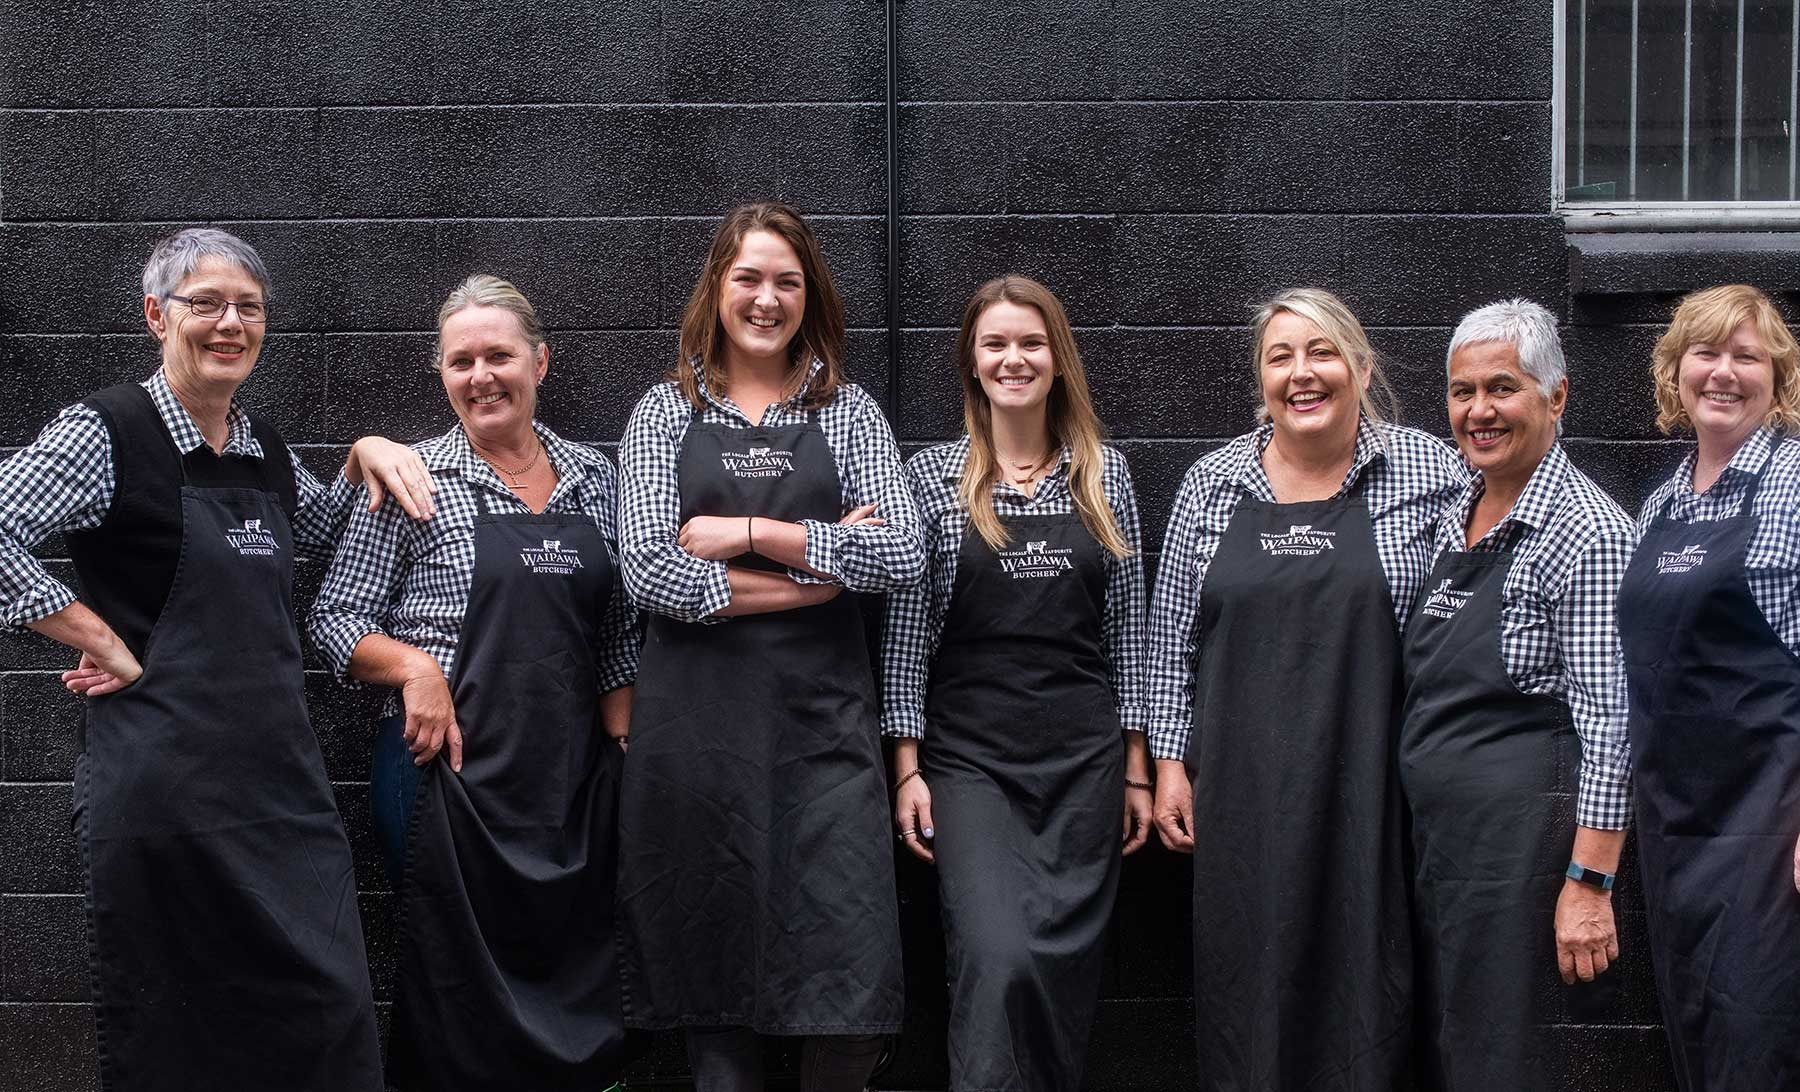 Waipawa-Butchery-Dec18-066-girl-team-web